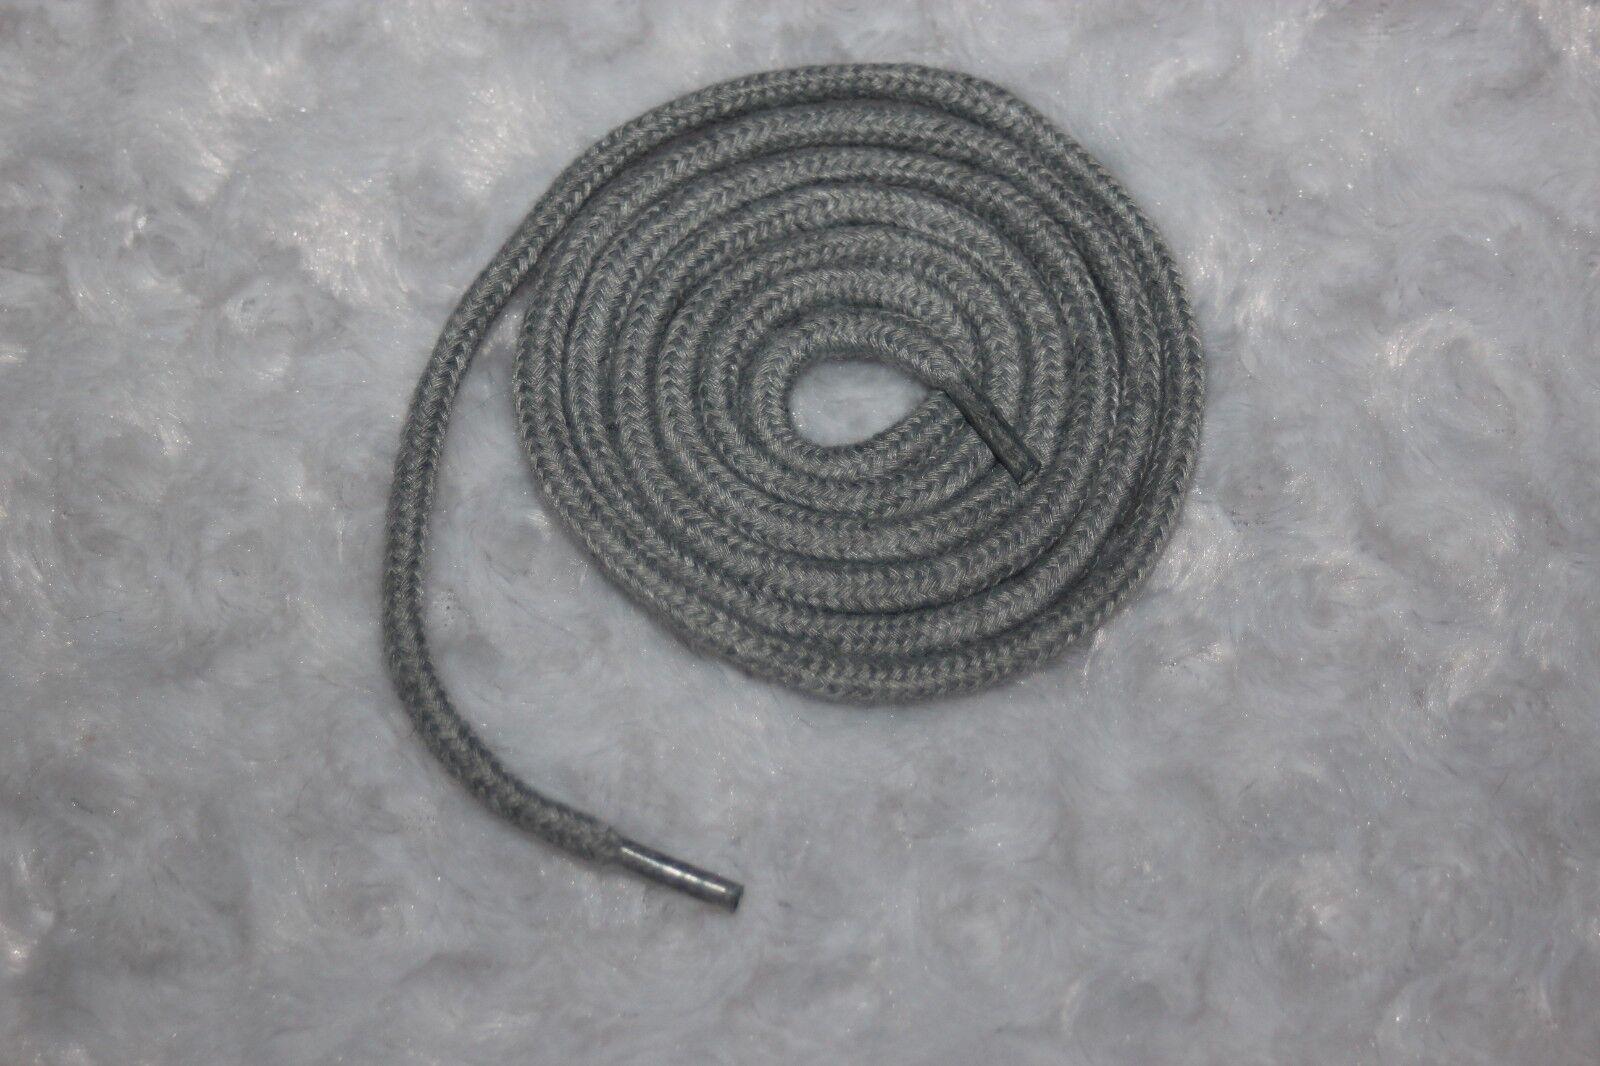 Replacement Drawstring White Red Black Gray plastic Tip Hoodies Sweatpants Bags Light Gray Plastic Tip 48